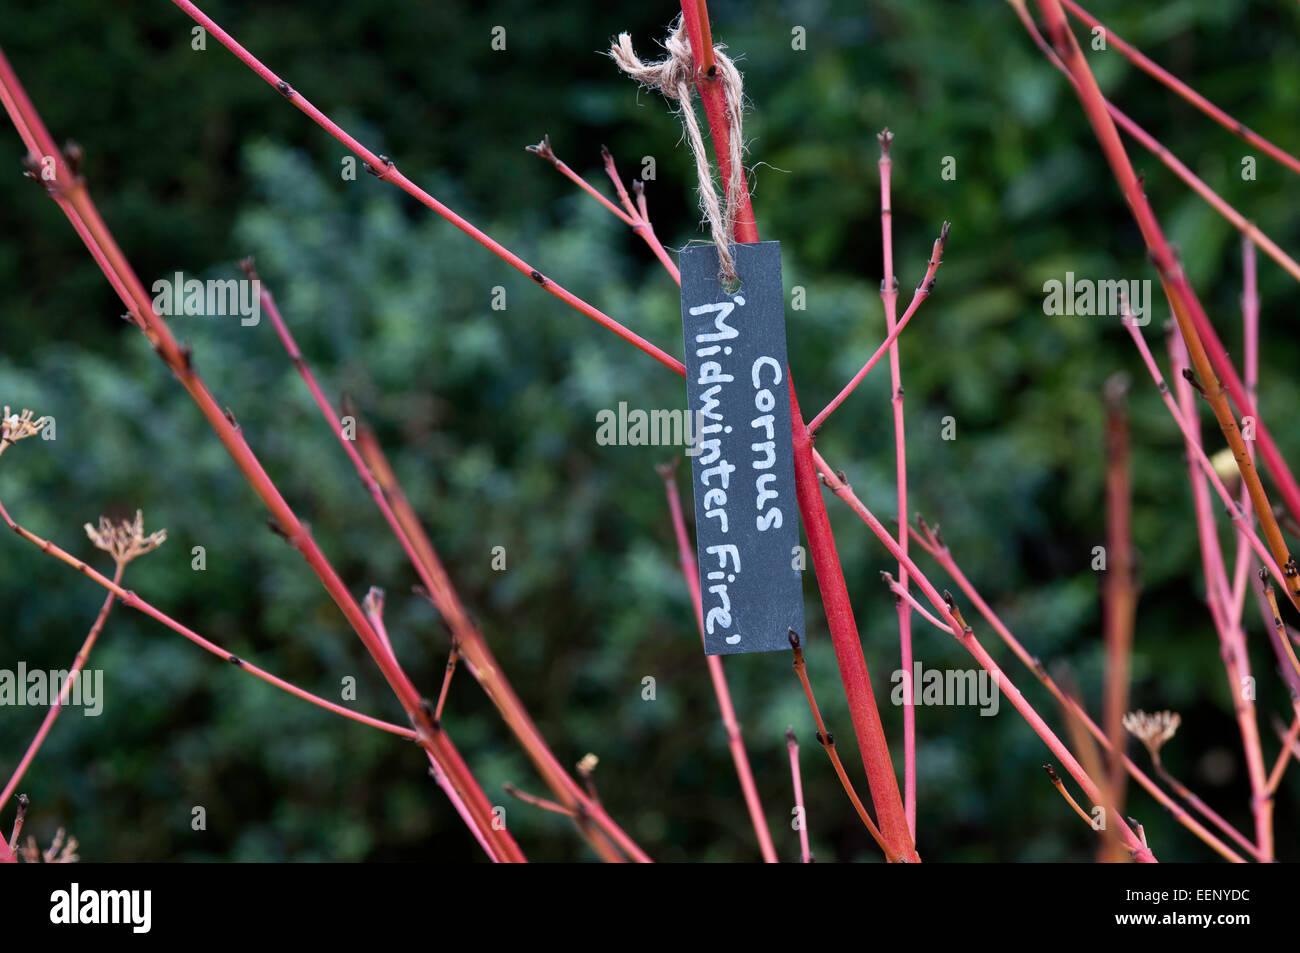 Hanging slate plant label - Stock Image